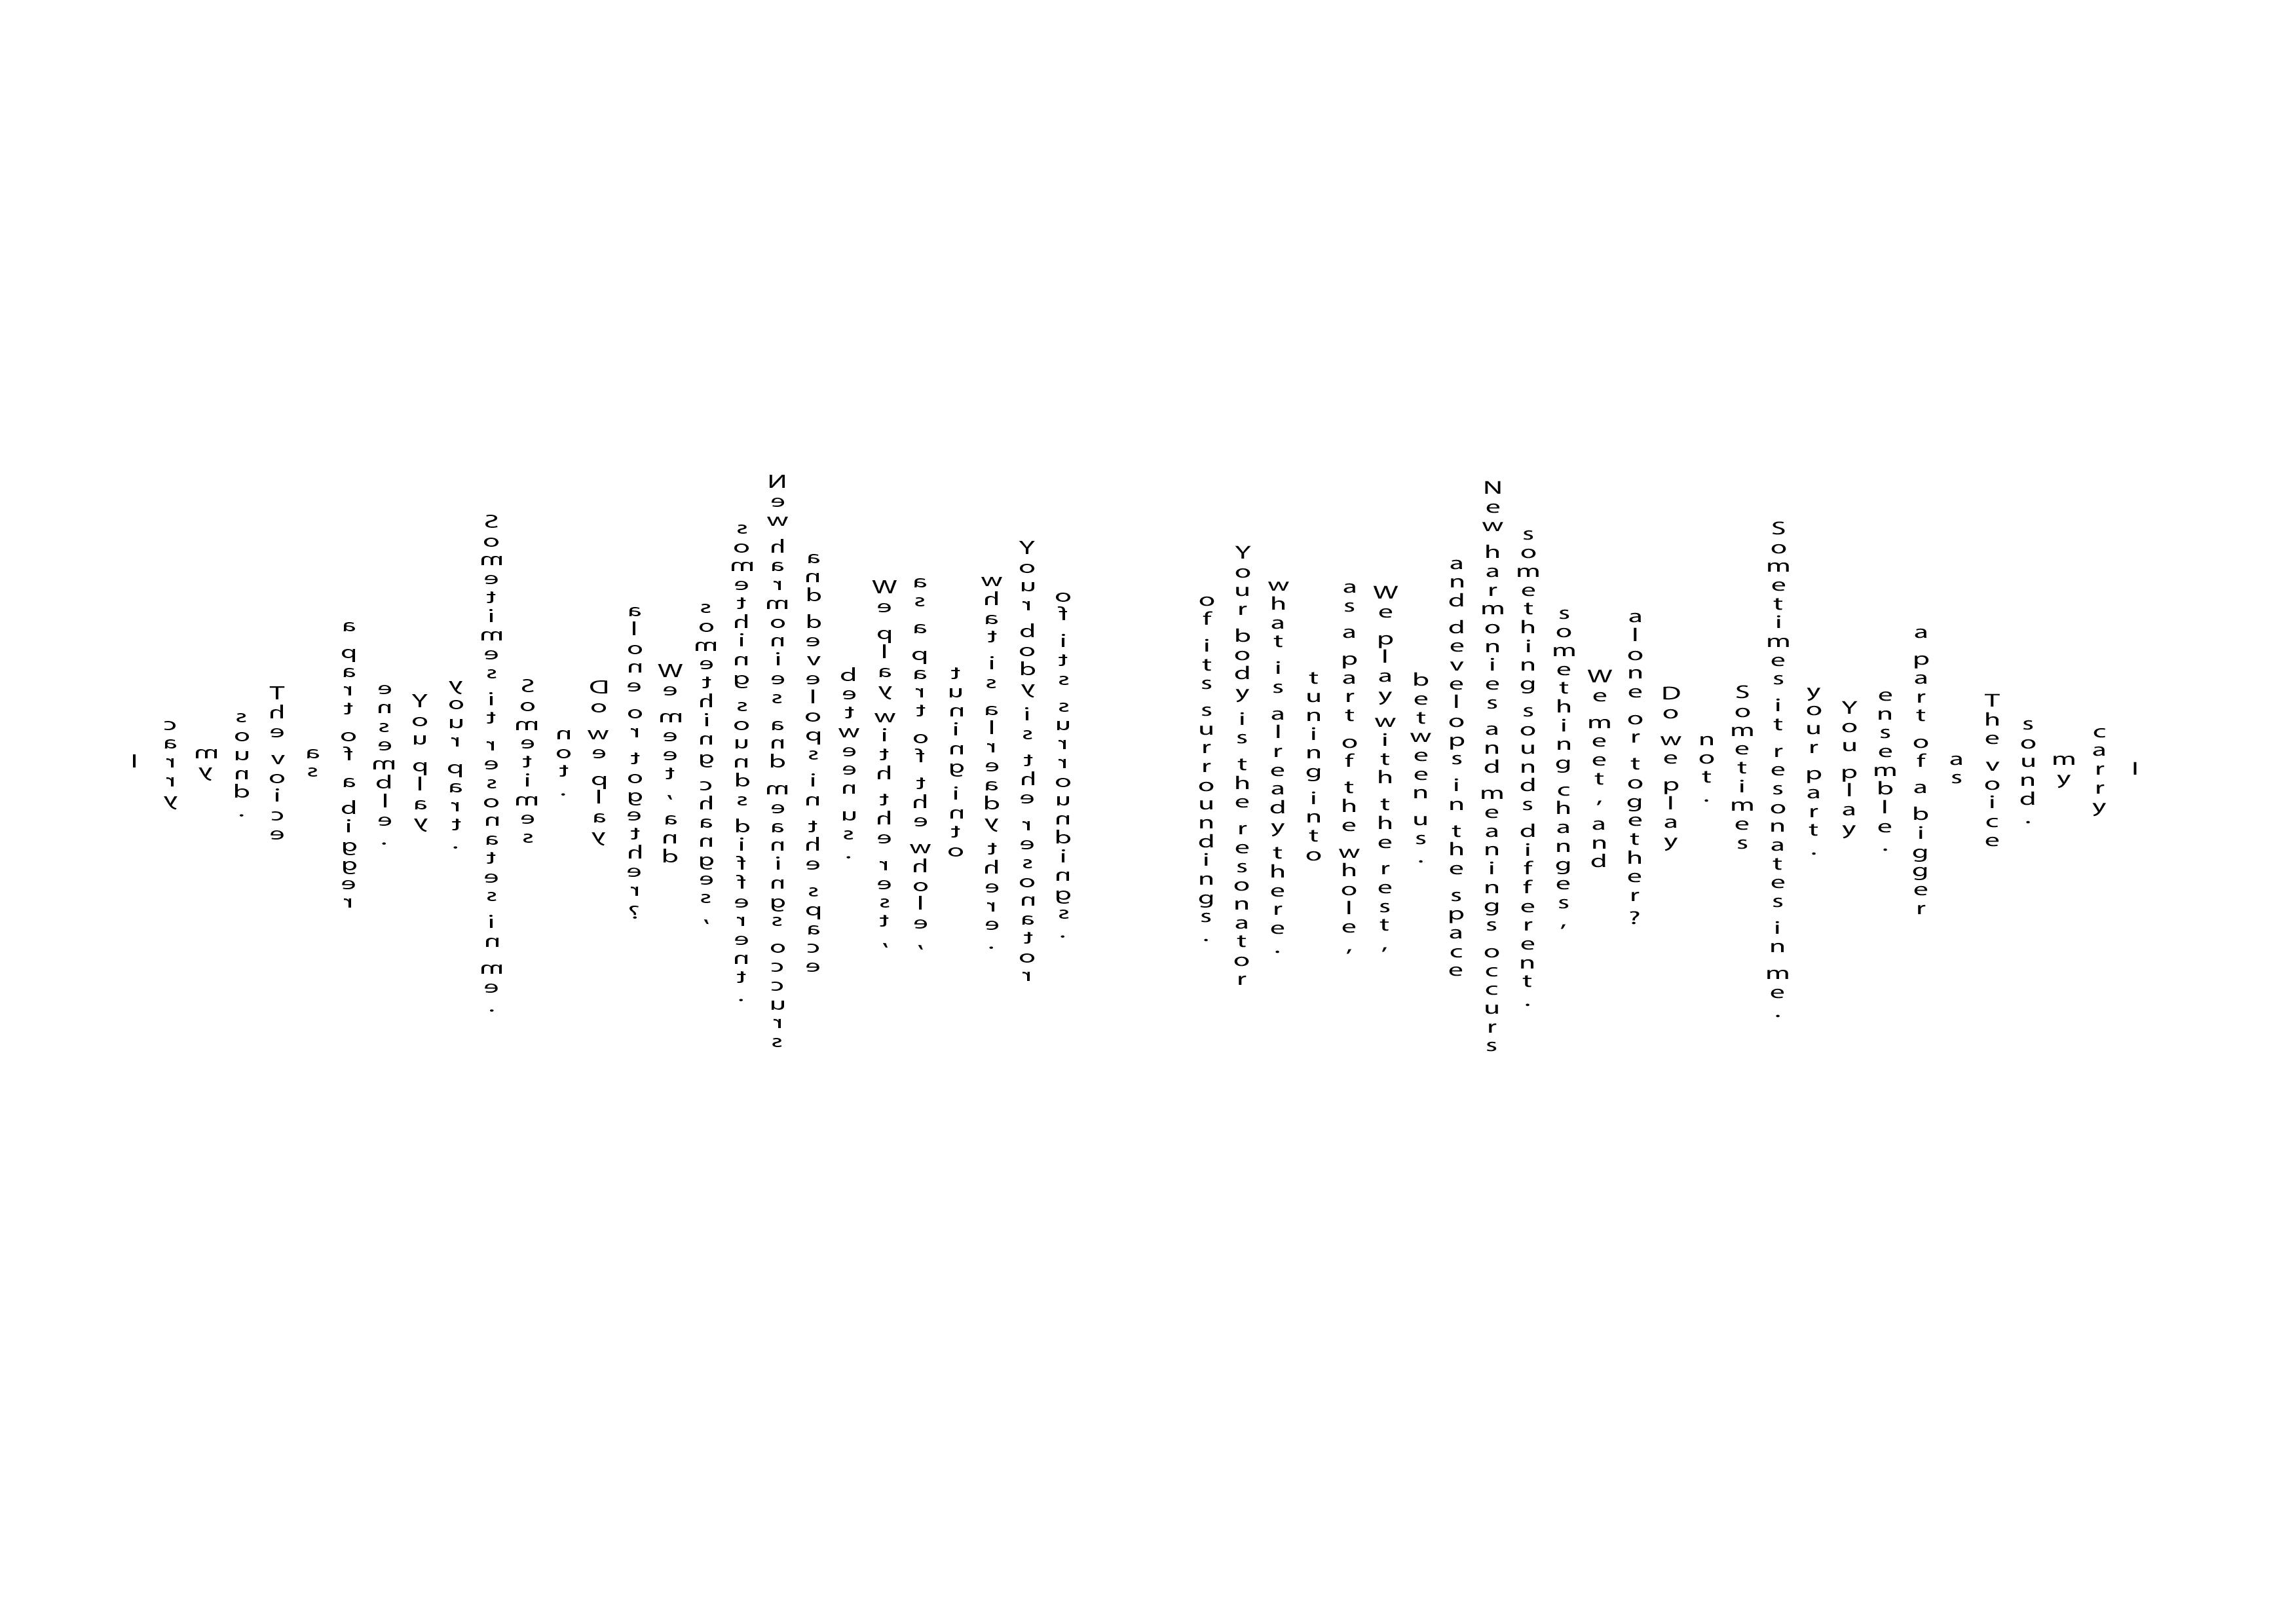 Lydtekst A6_LG-01